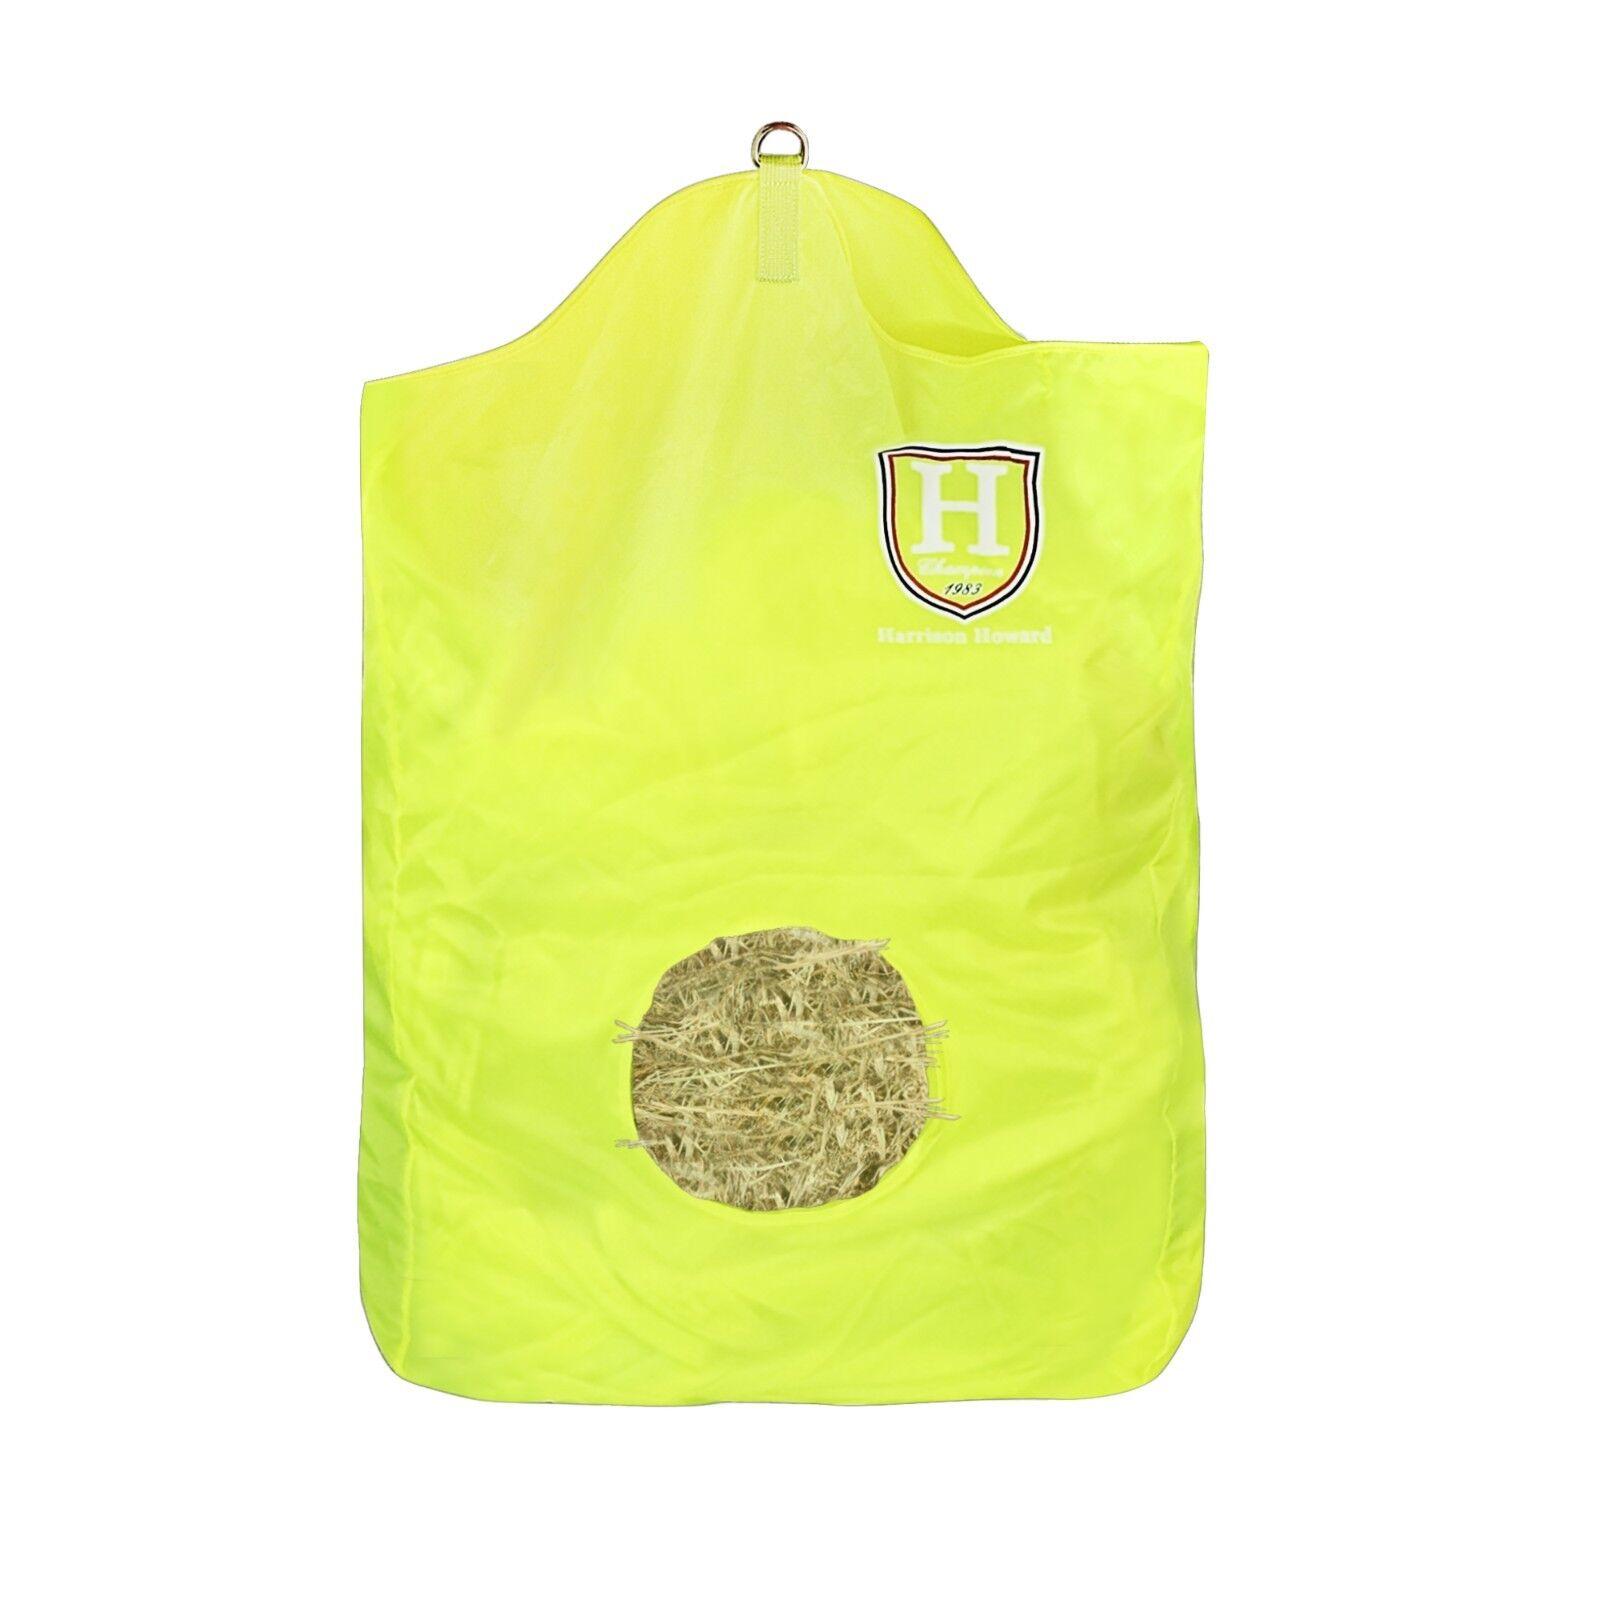 Harrison Howard Hay Bag extra large feeding bag clean saving net Durable Quality